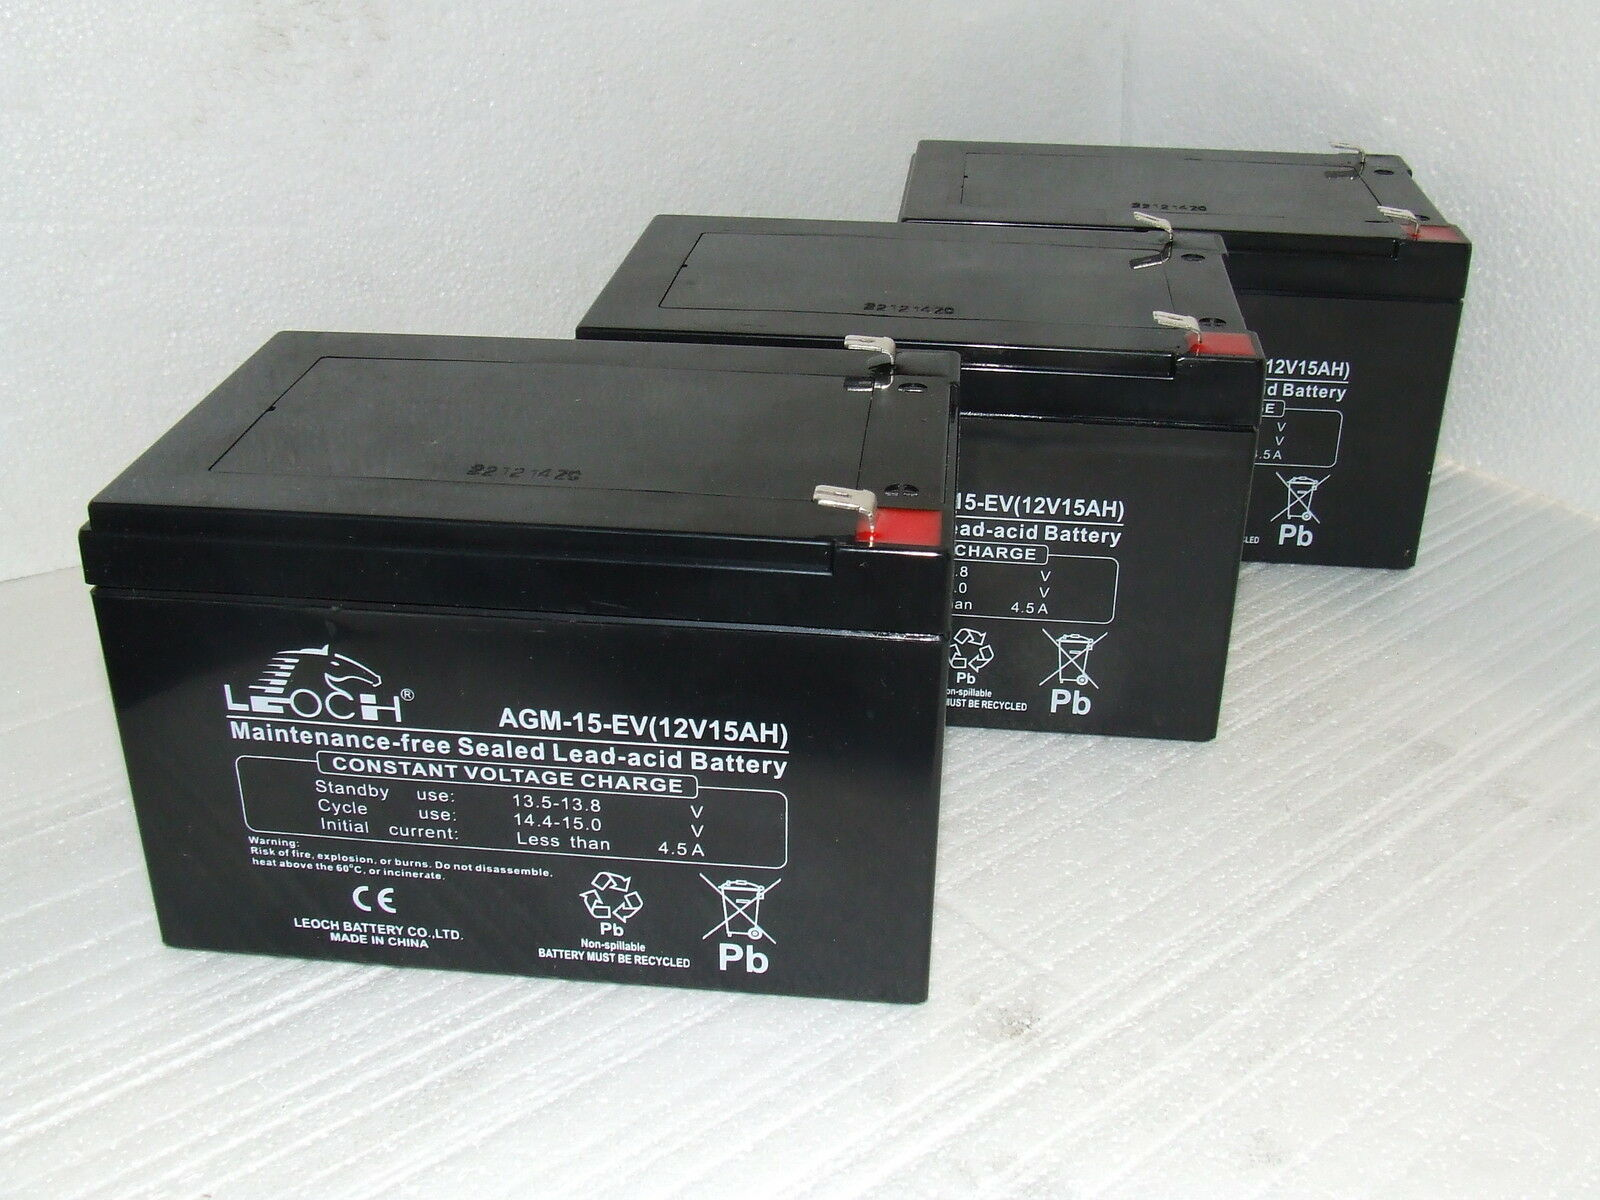 3 x LEOCH 12V 15ah (replaces 12ah, 14ah) HEAVIER DUTY DEEP CYCLE Batteries